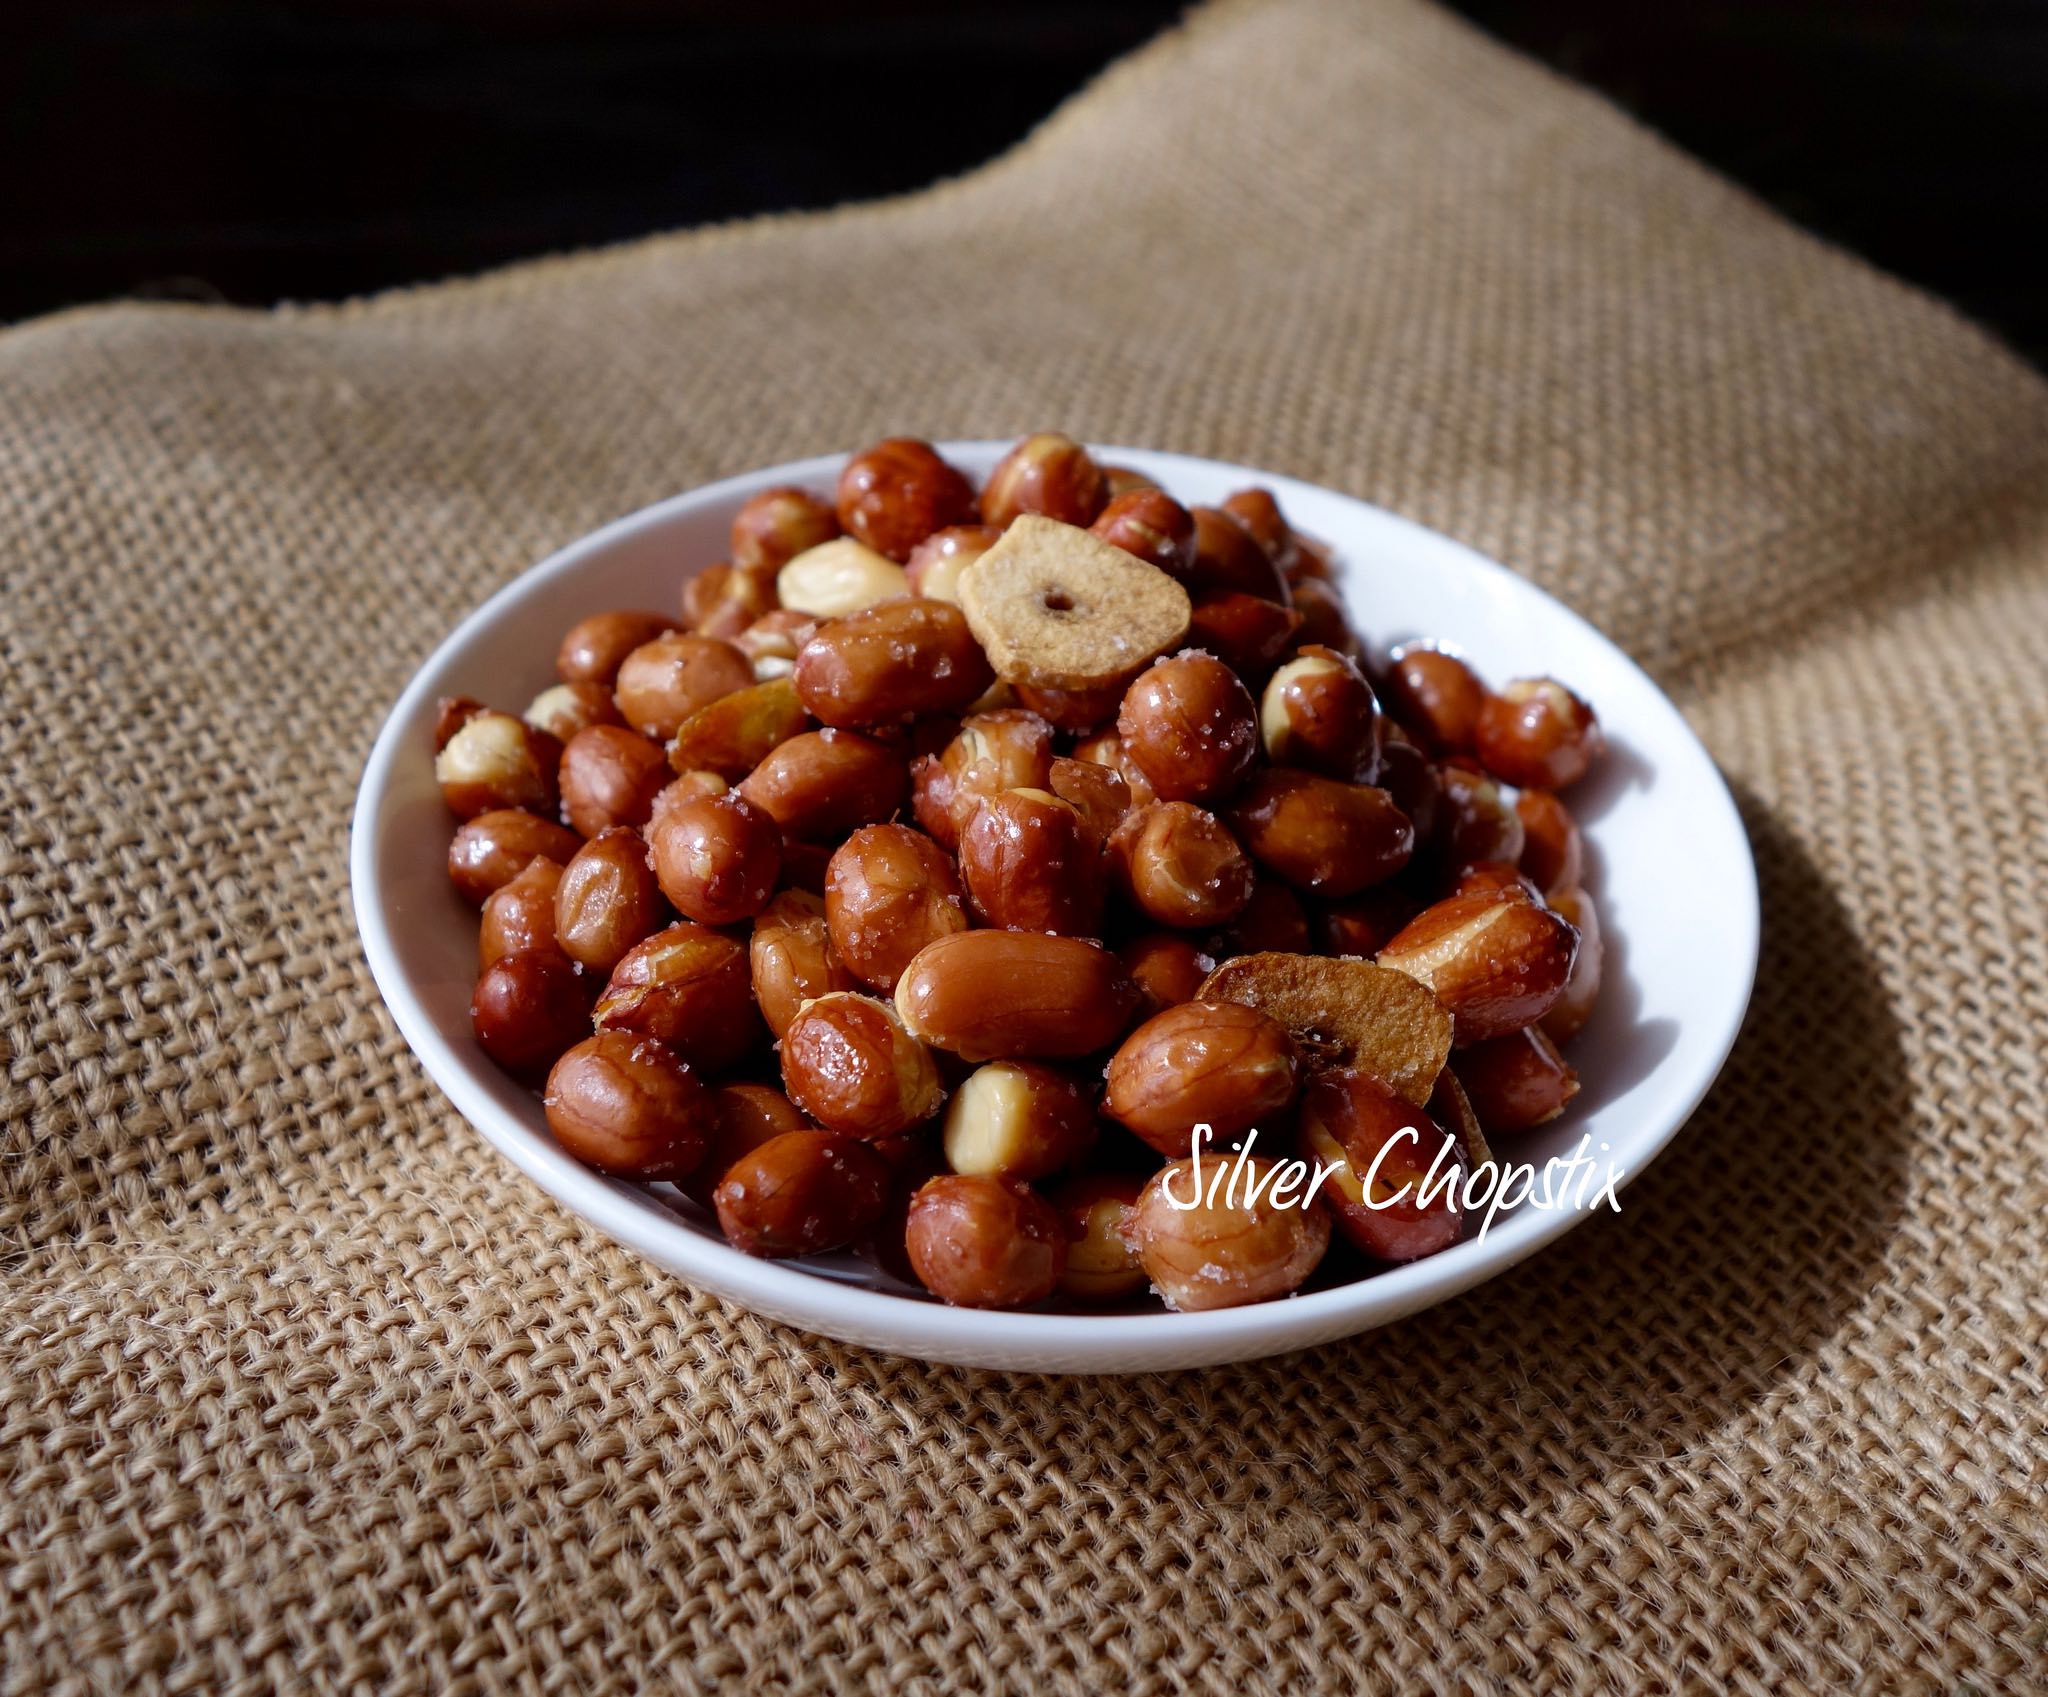 Adobong Mani (Stir fried nuts with Garlic)